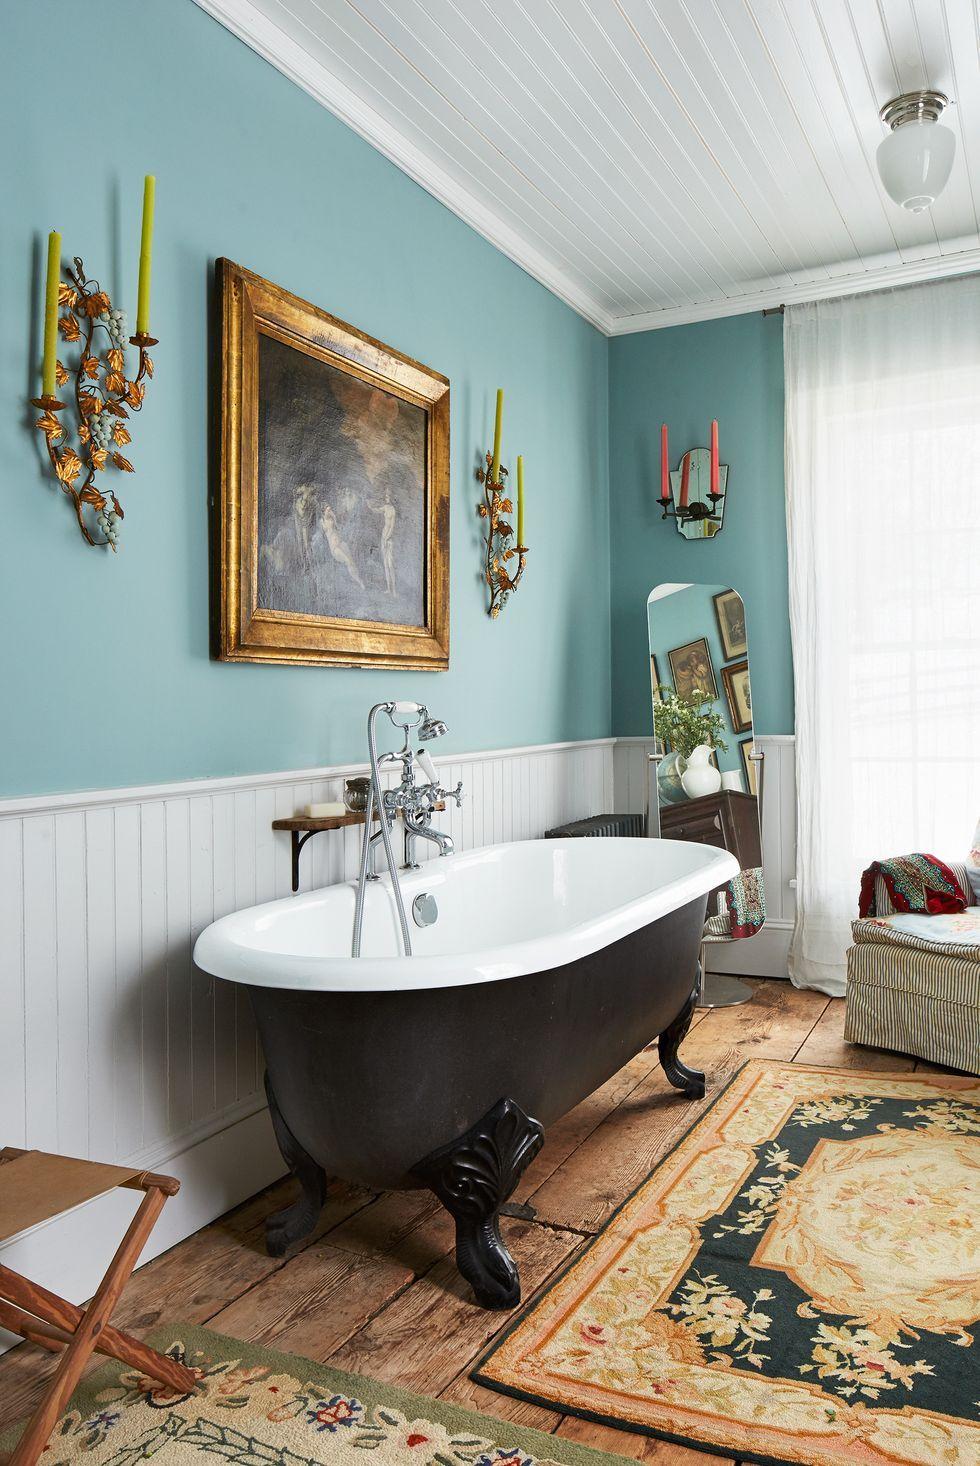 28 Stylish Bathroom Shelf Ideas The Most Clever Bathroom Storage Solutions